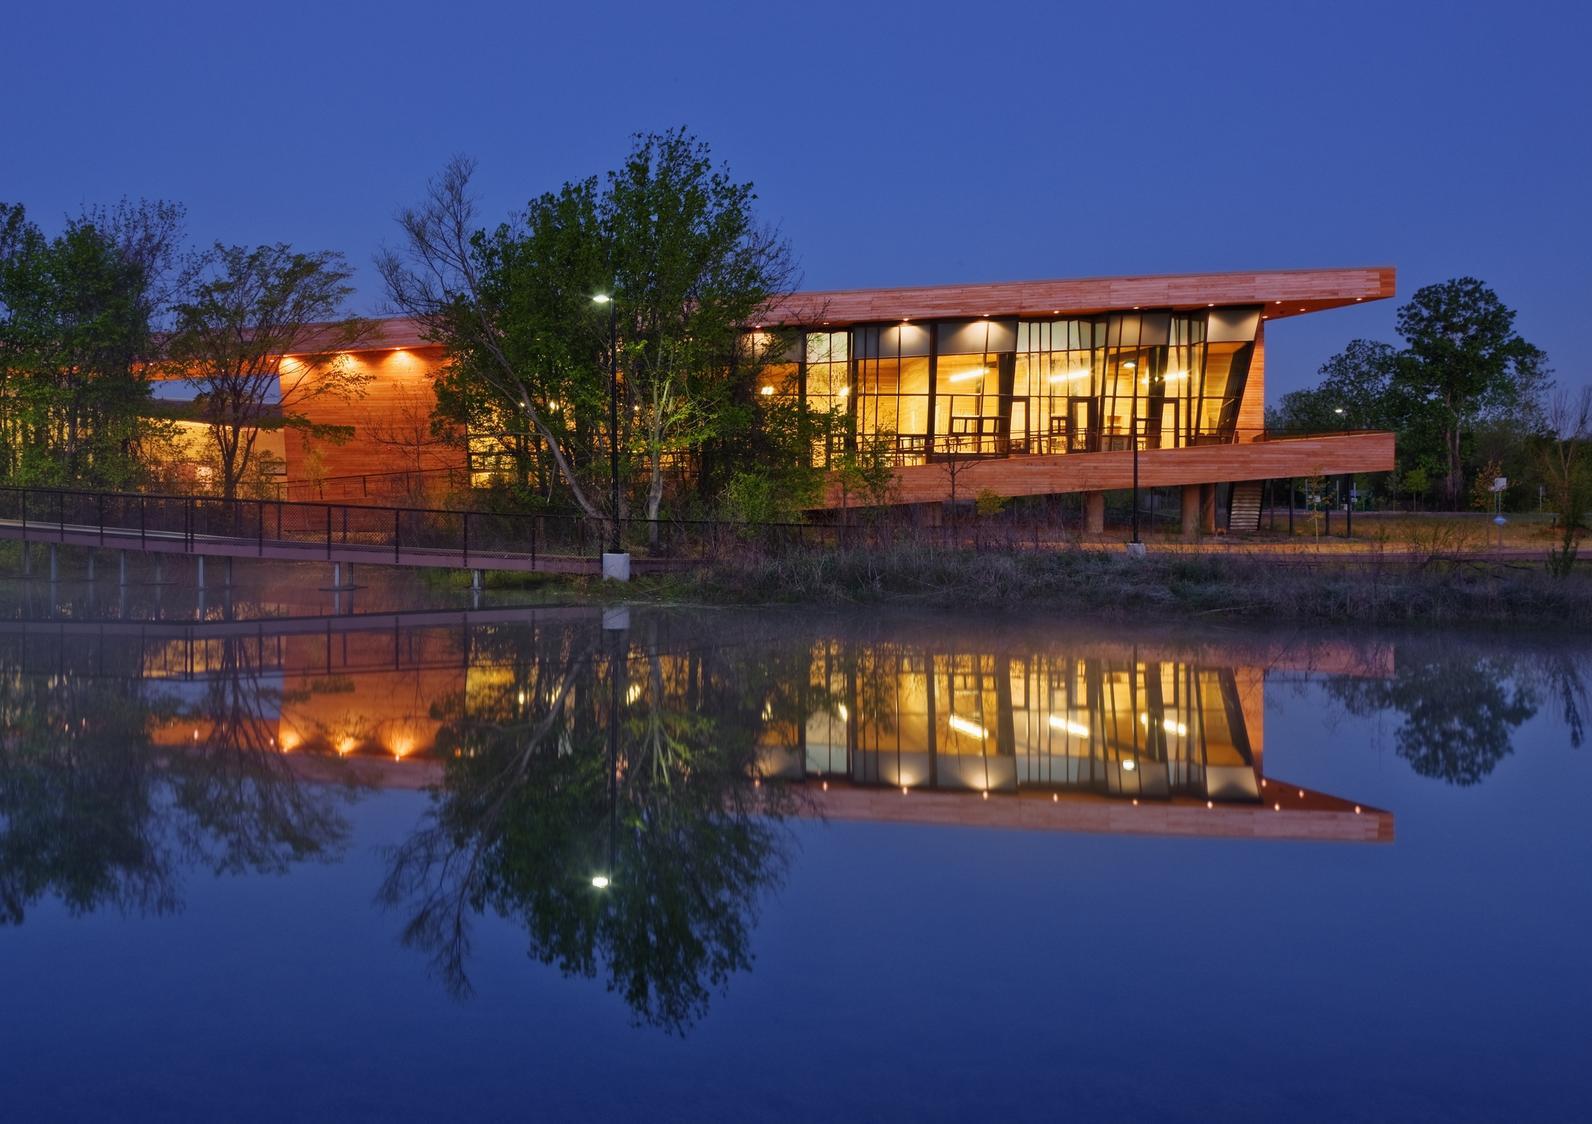 Image result for Trinity river audubon center